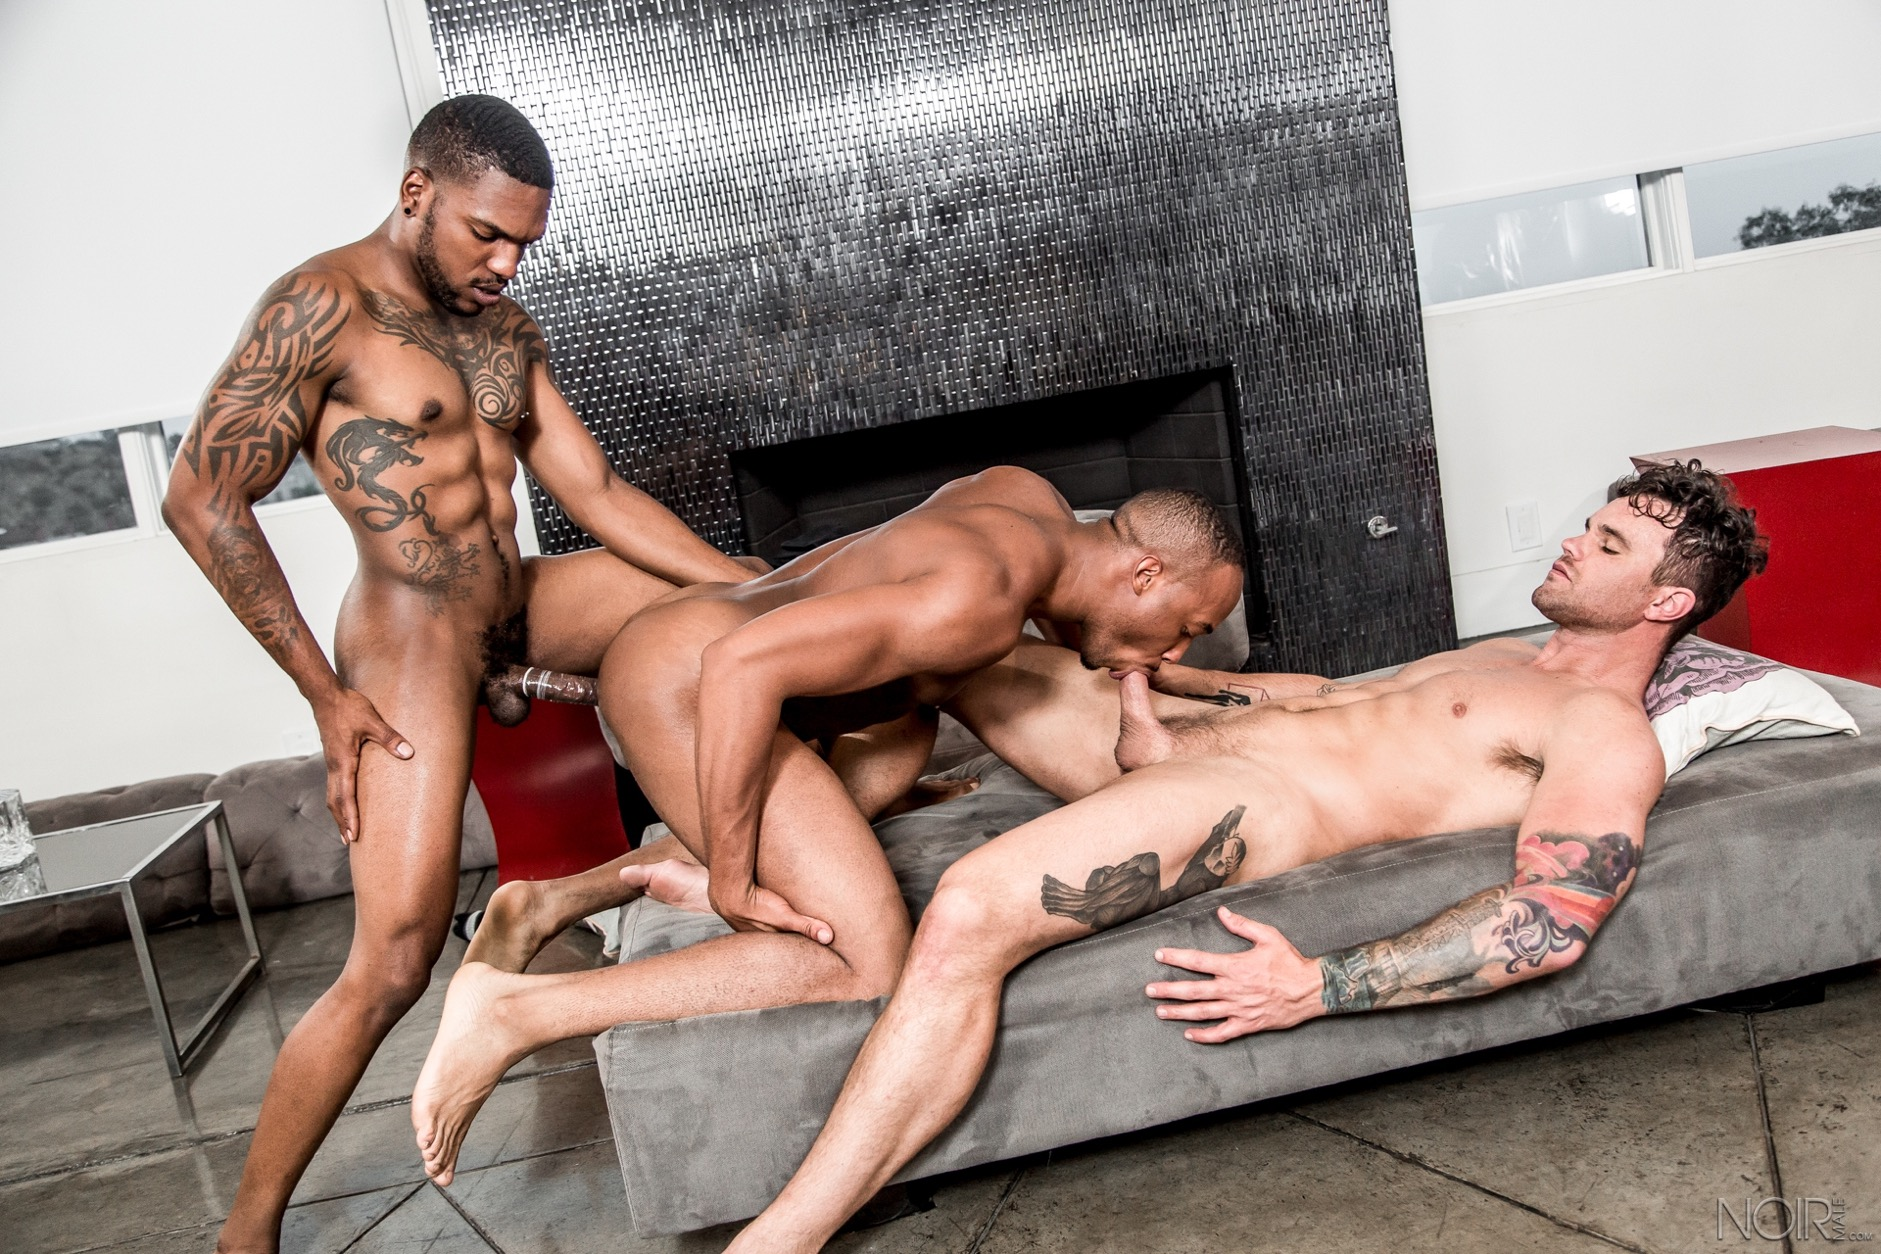 interracial gay threesome